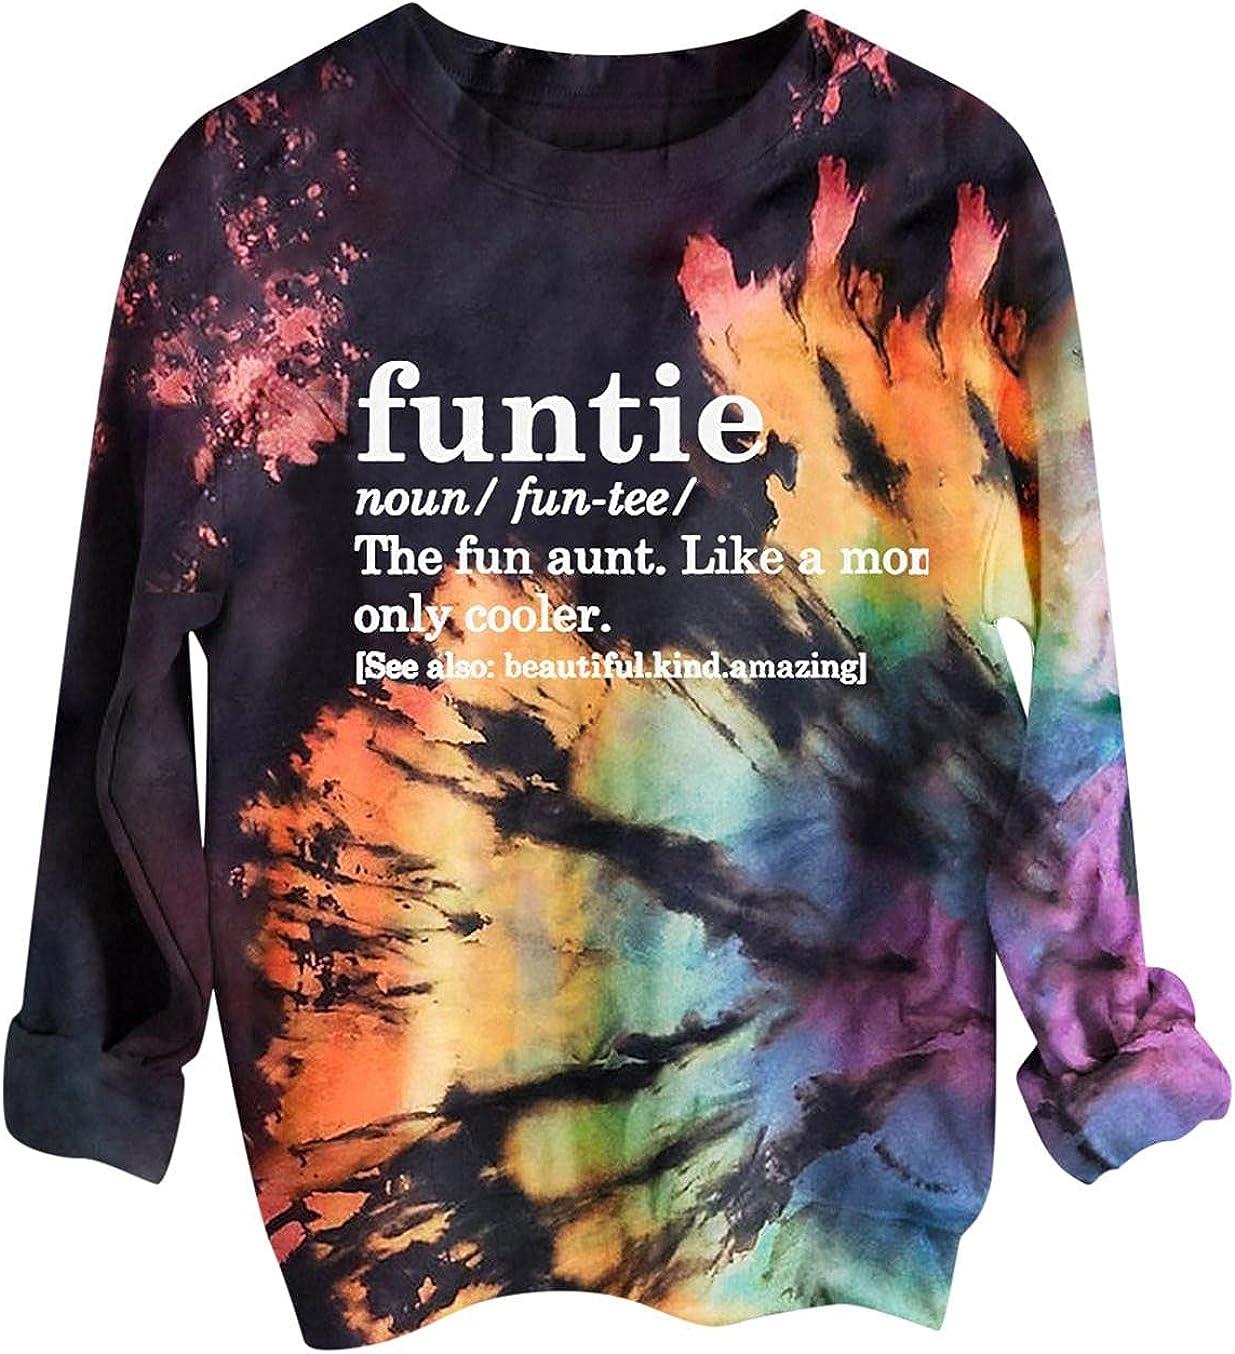 Toeava Tie-dye Sweatshirt for Women Long Sleeve Funtie Mama Graphic Sweatshirts Halloween Pullover Casual Tops